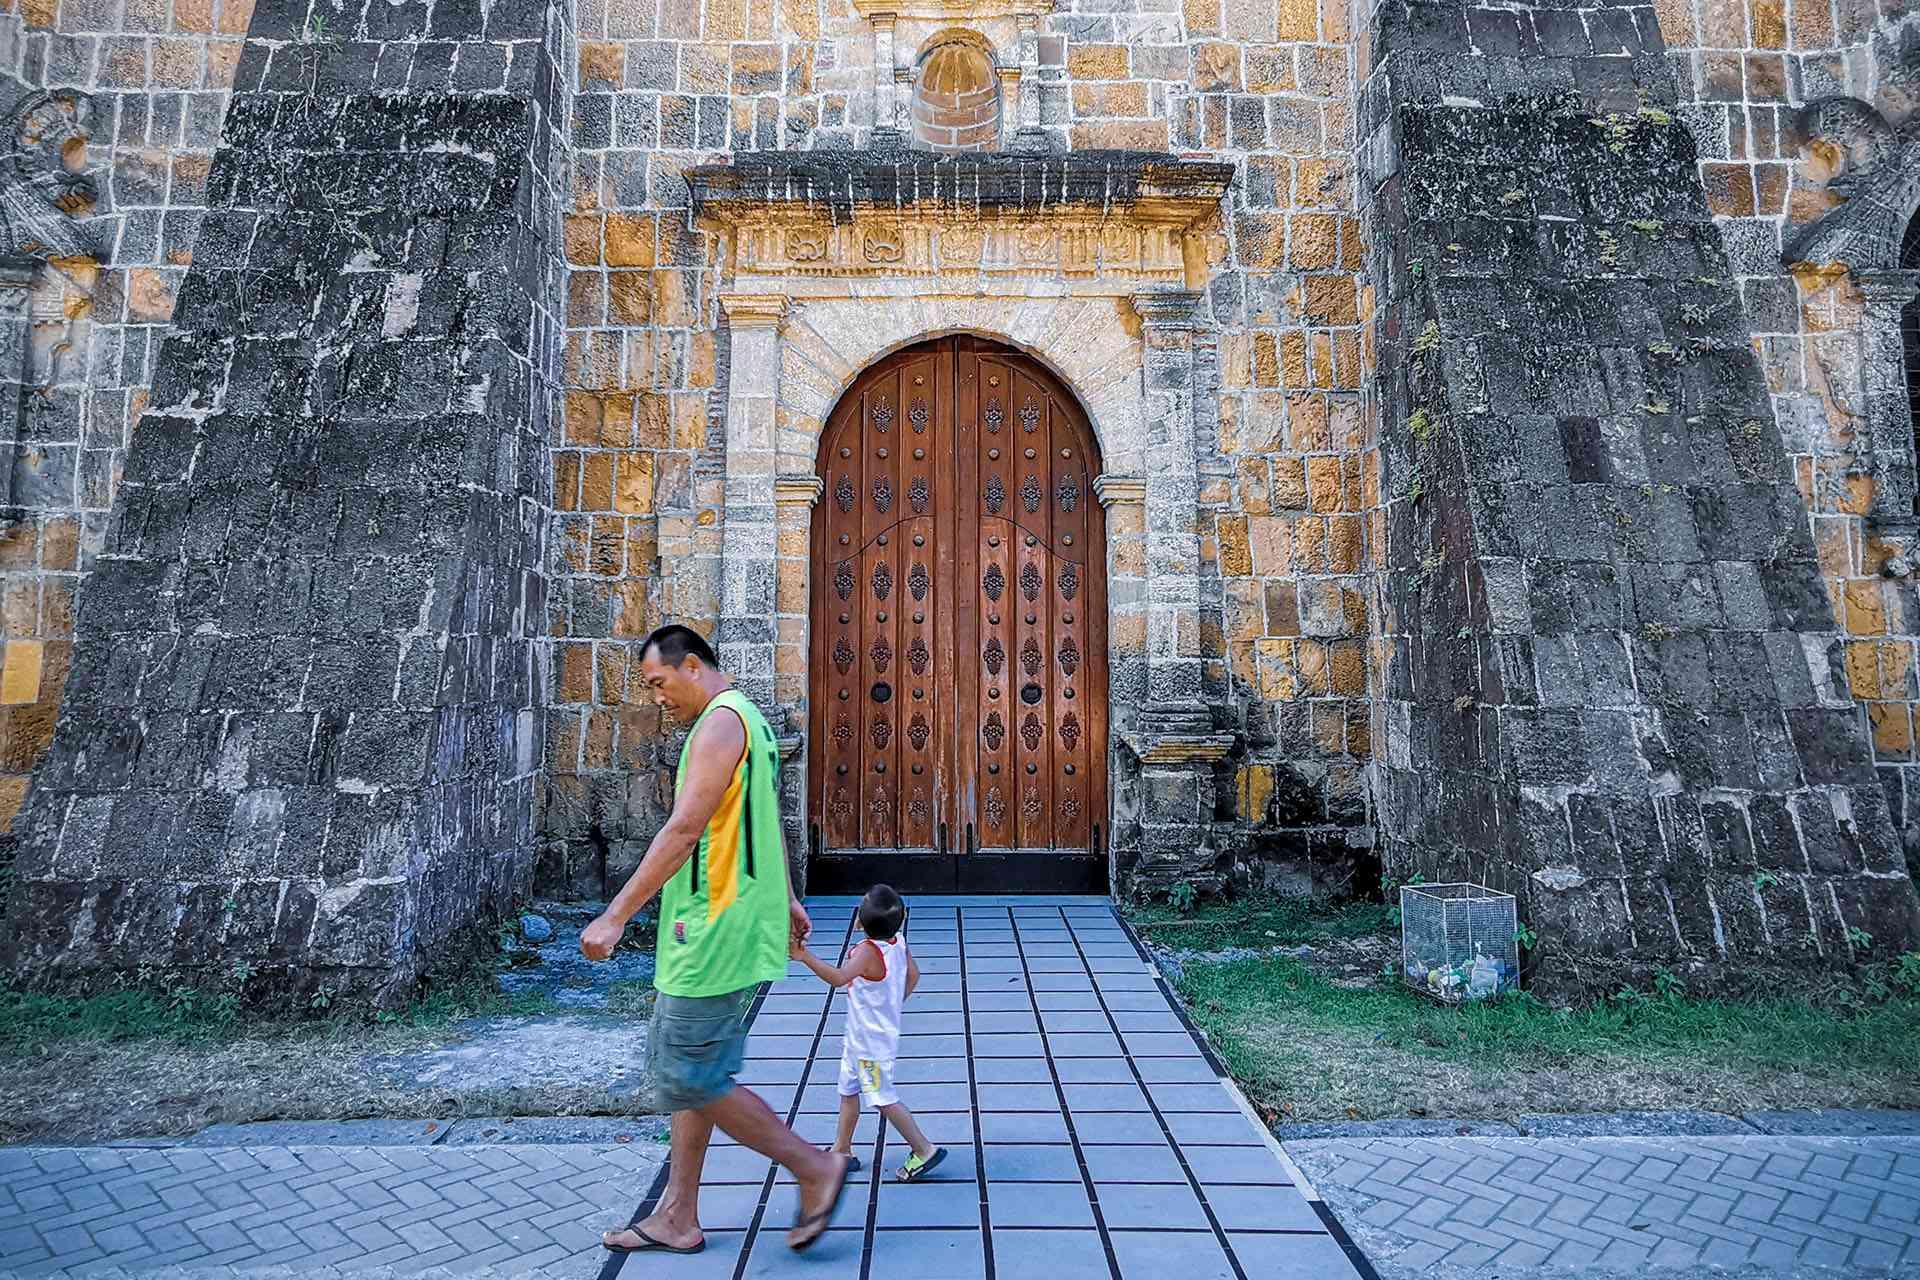 Door of Miag-ao Church, Iloilo, Philippines